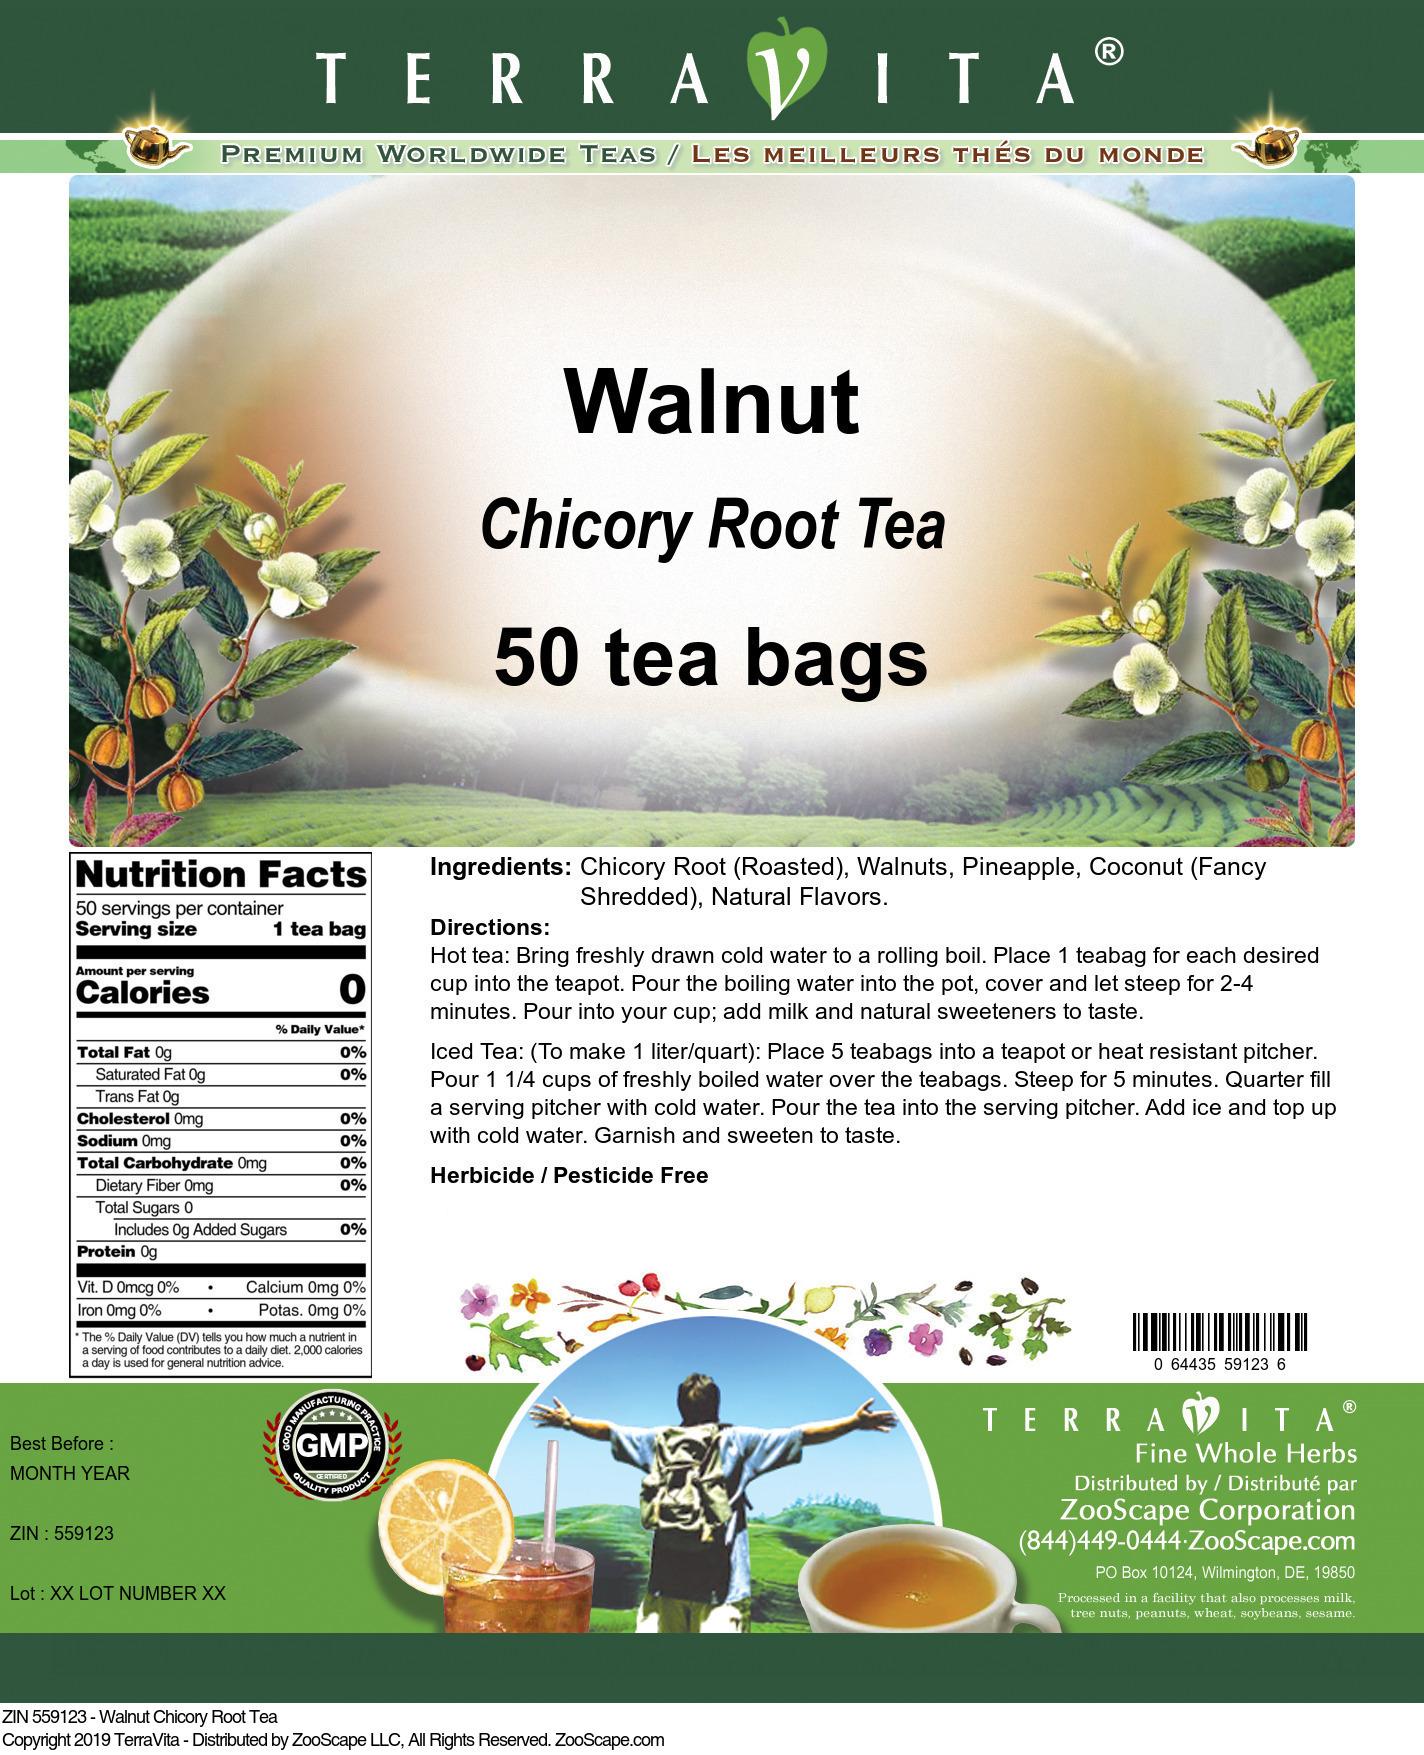 Walnut Chicory Root Tea